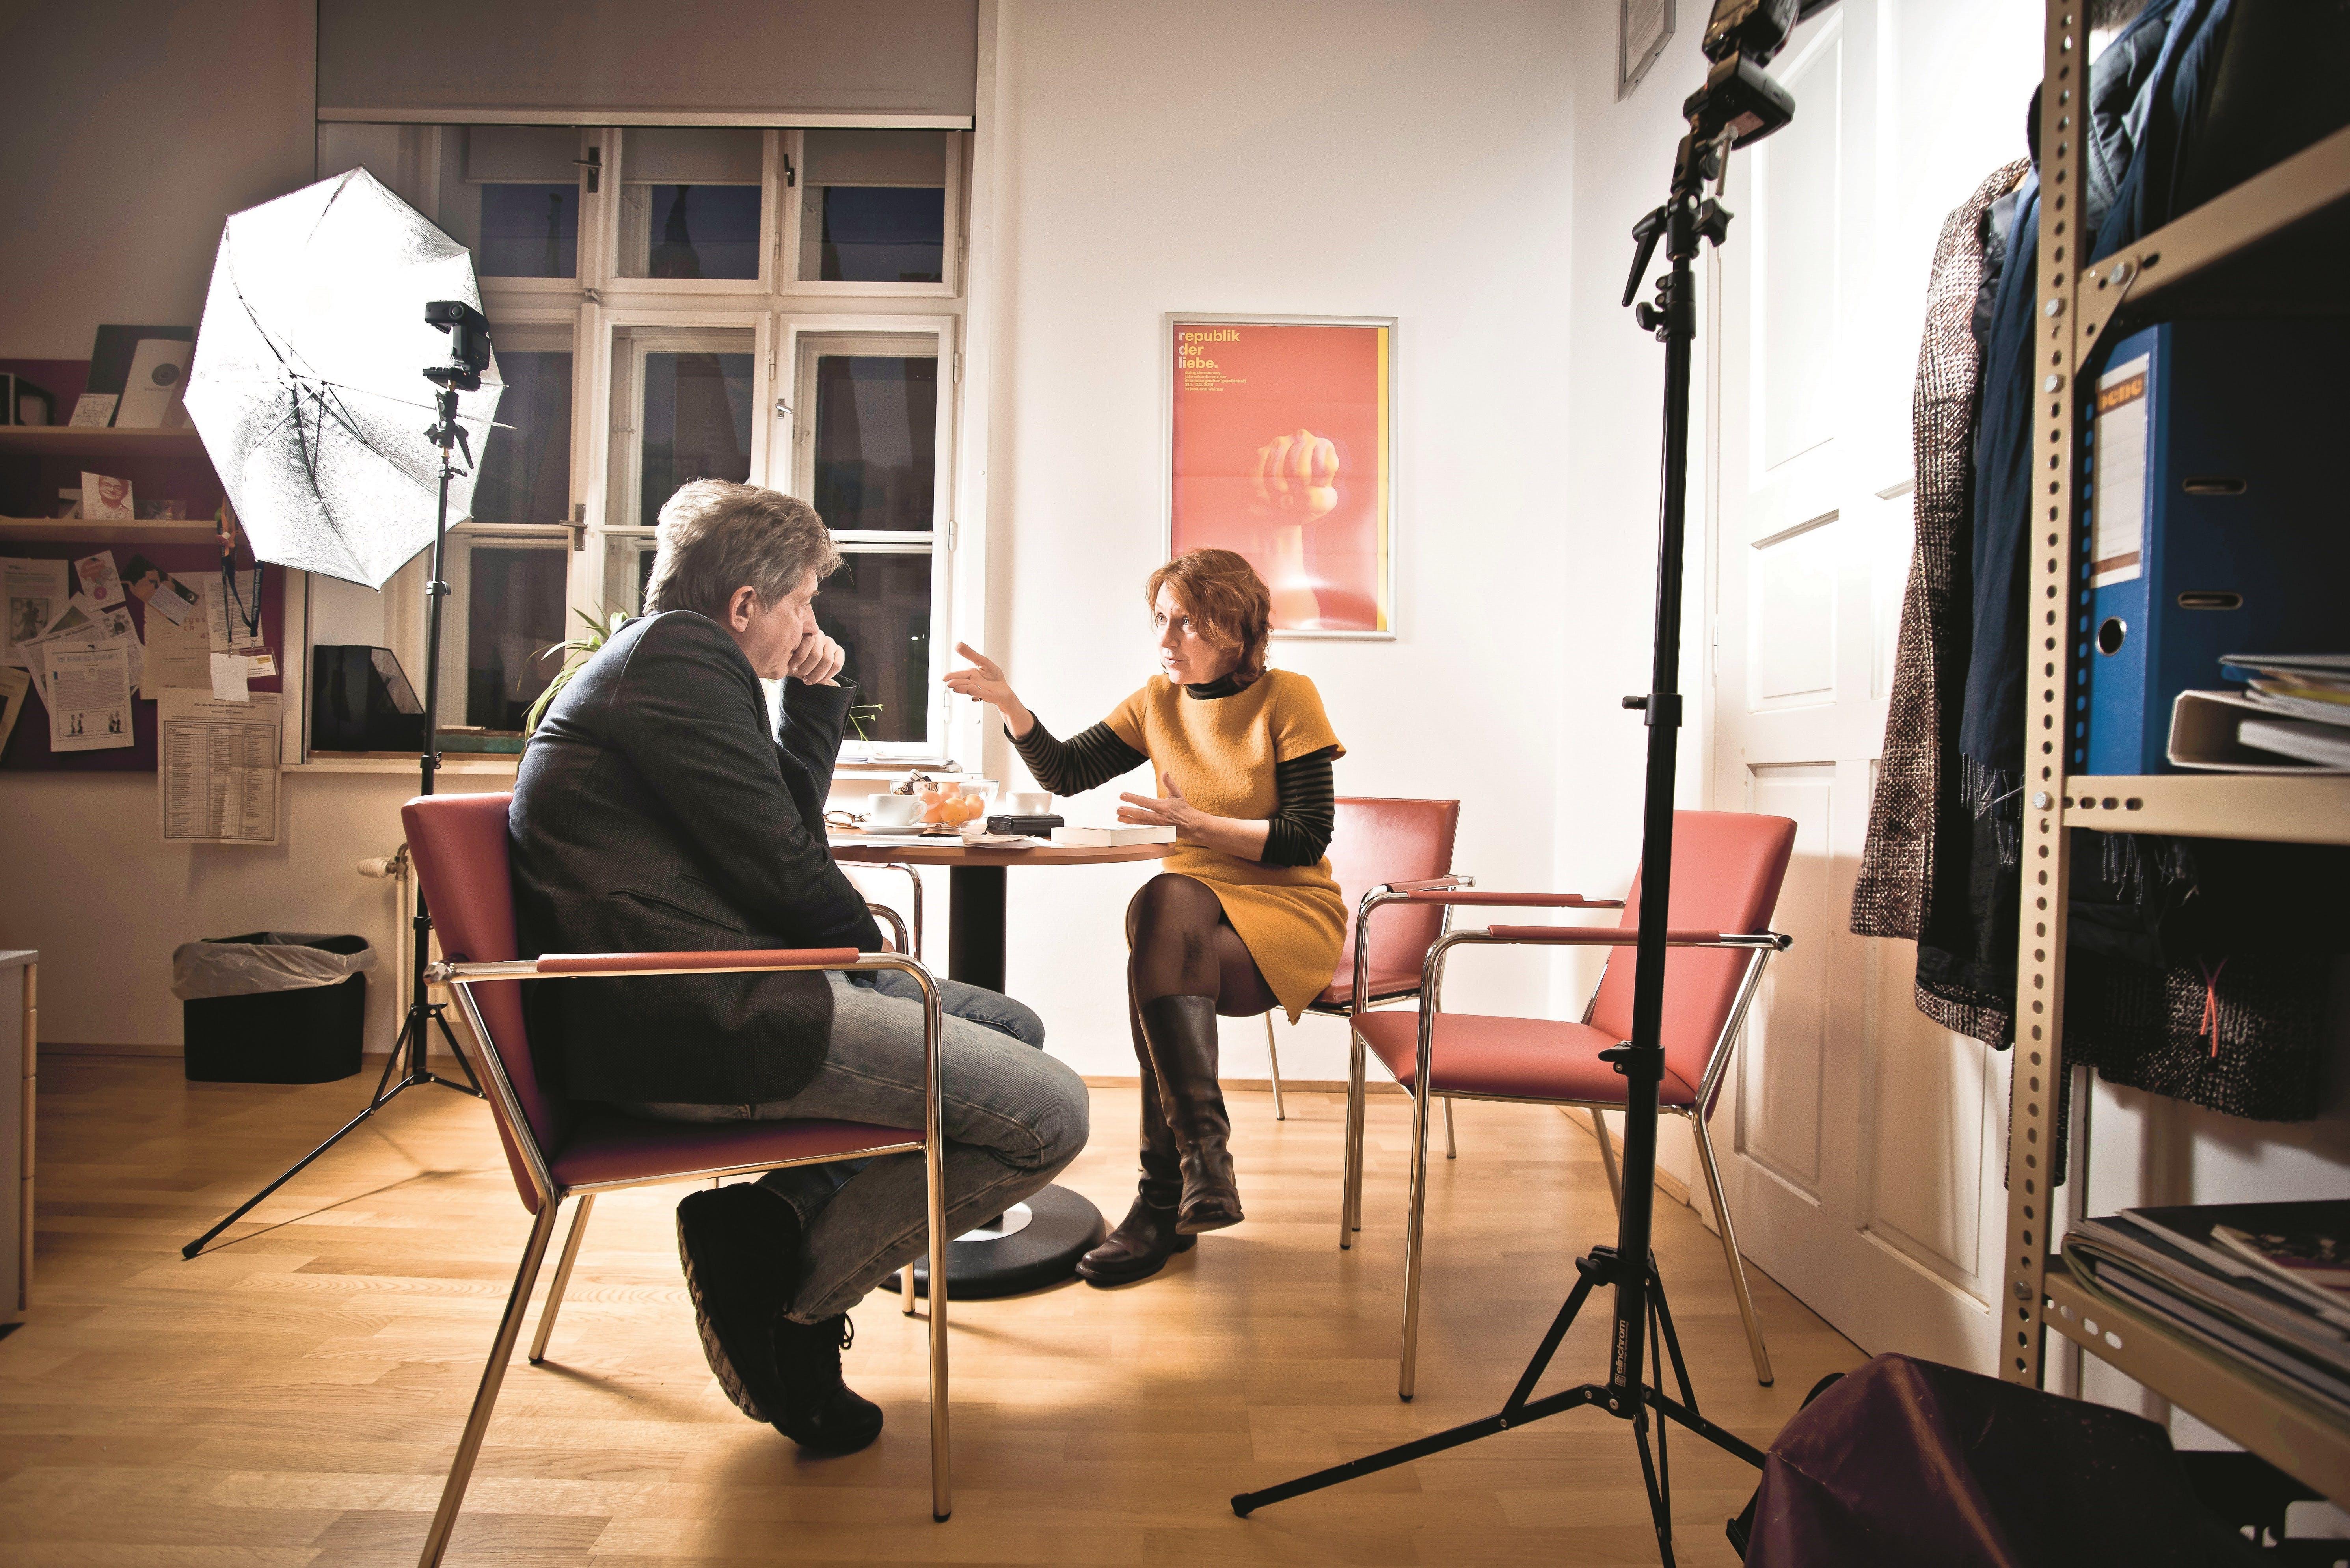 Politikwissenschaftlerin Guérot mit morgen-Autor Thomas Trenkler